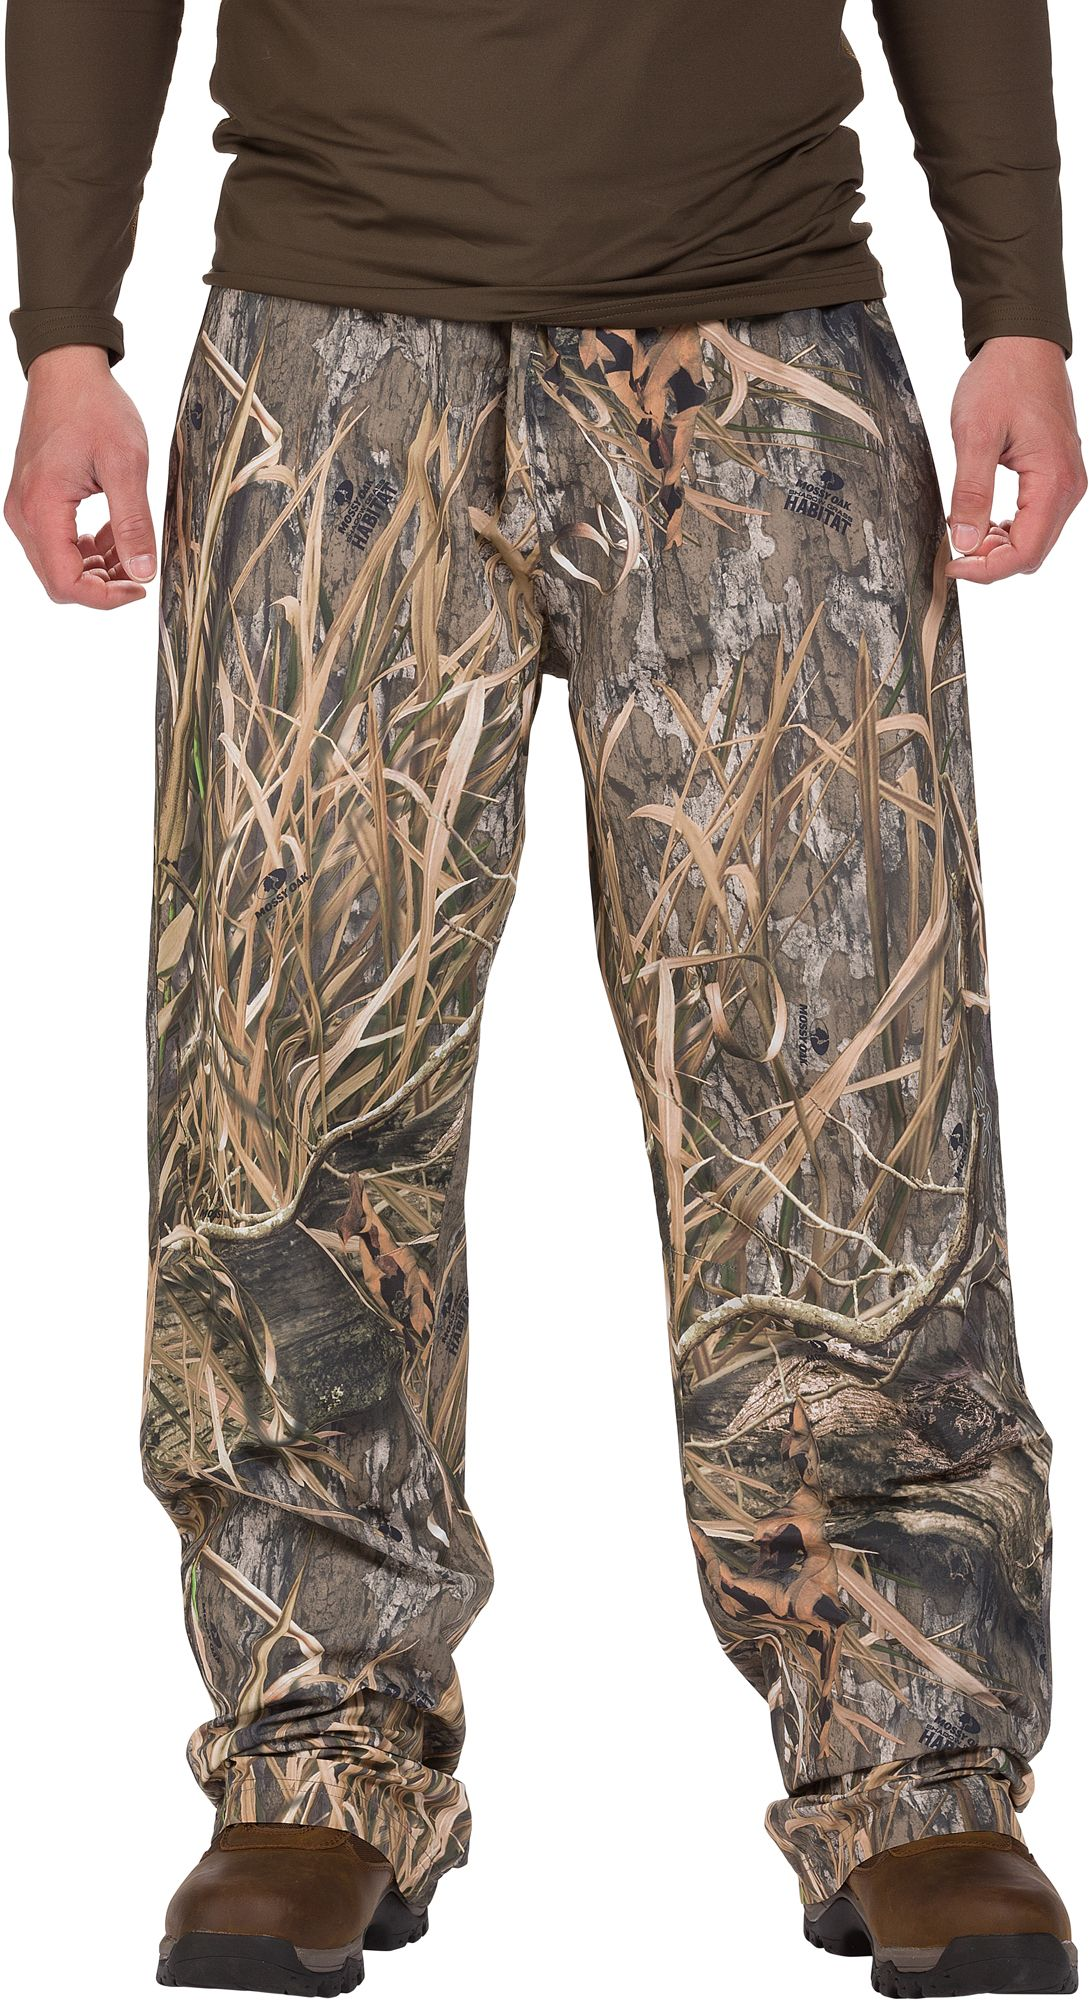 Browning CFS Hunting Rain Pants, Men's, Medium, Mossy Oak Shadow Grass